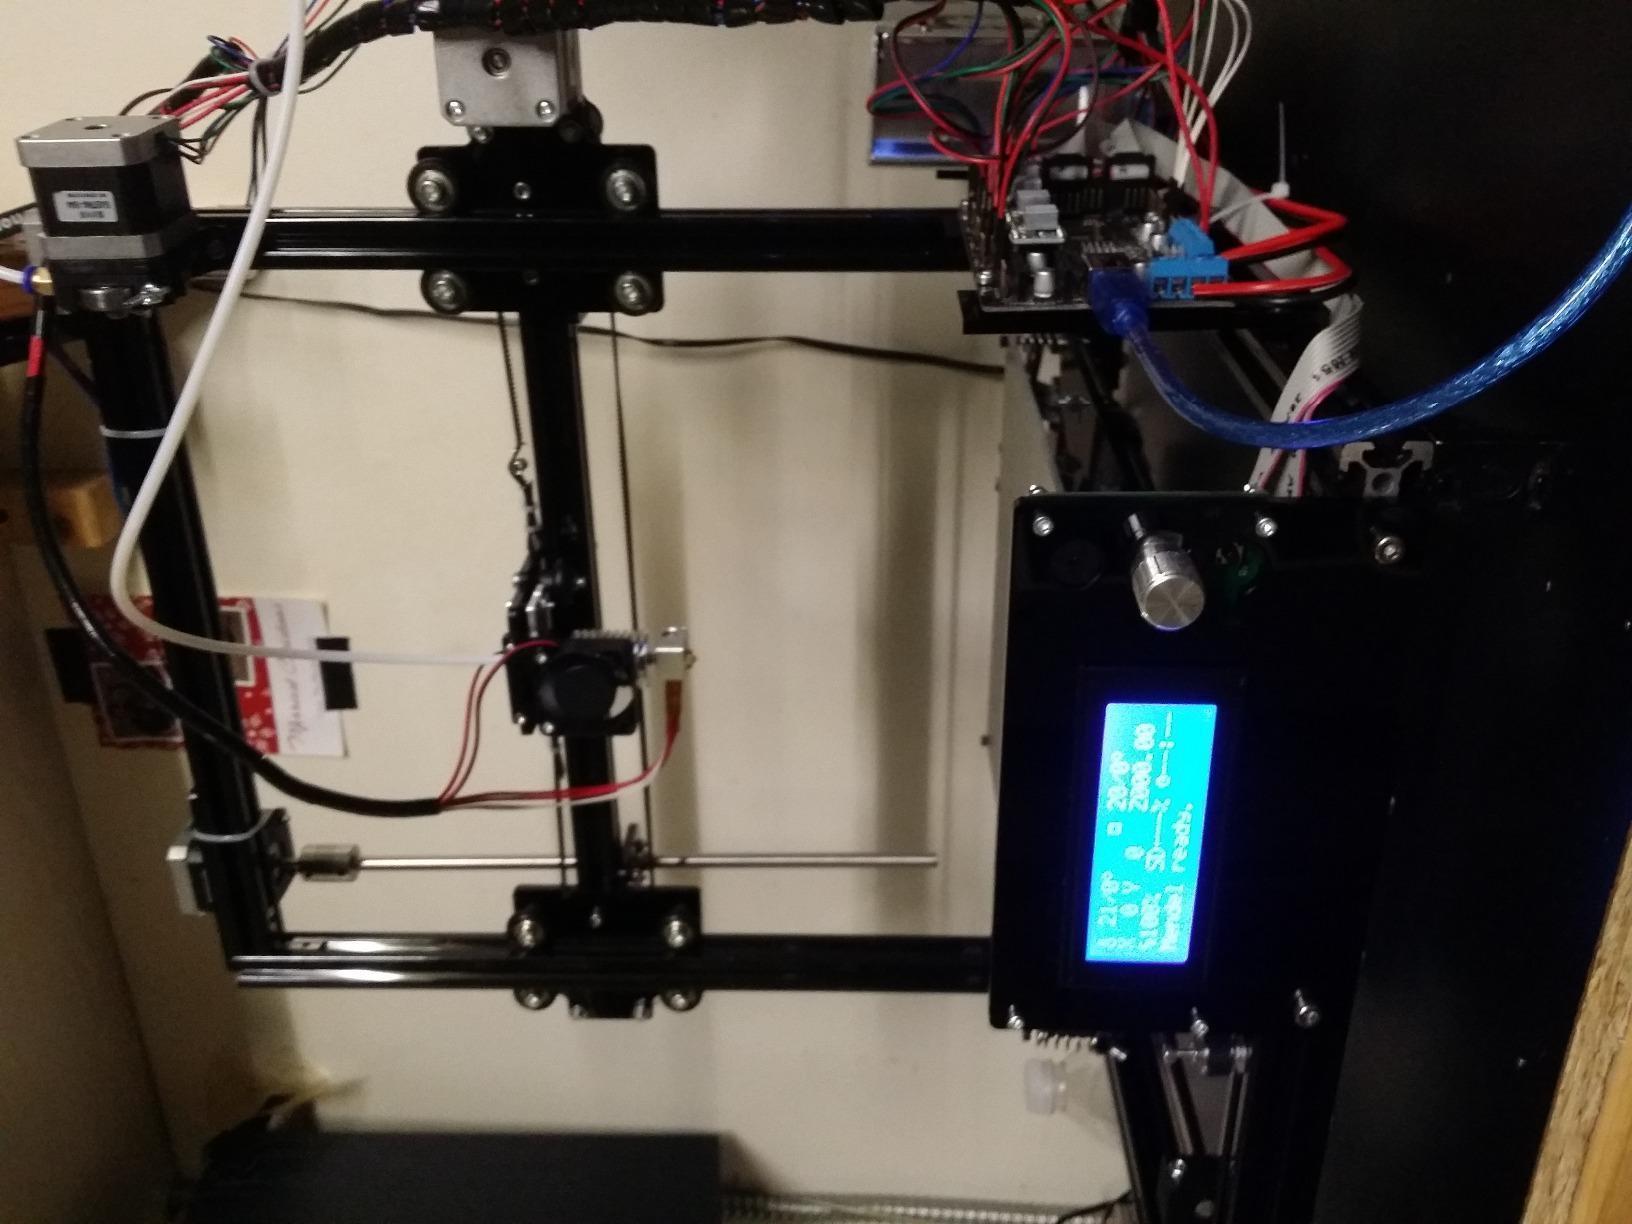 FLSUN 3D Printer Prusa i3 DIY Kit Auto Leveling RepRap Desktop 3D